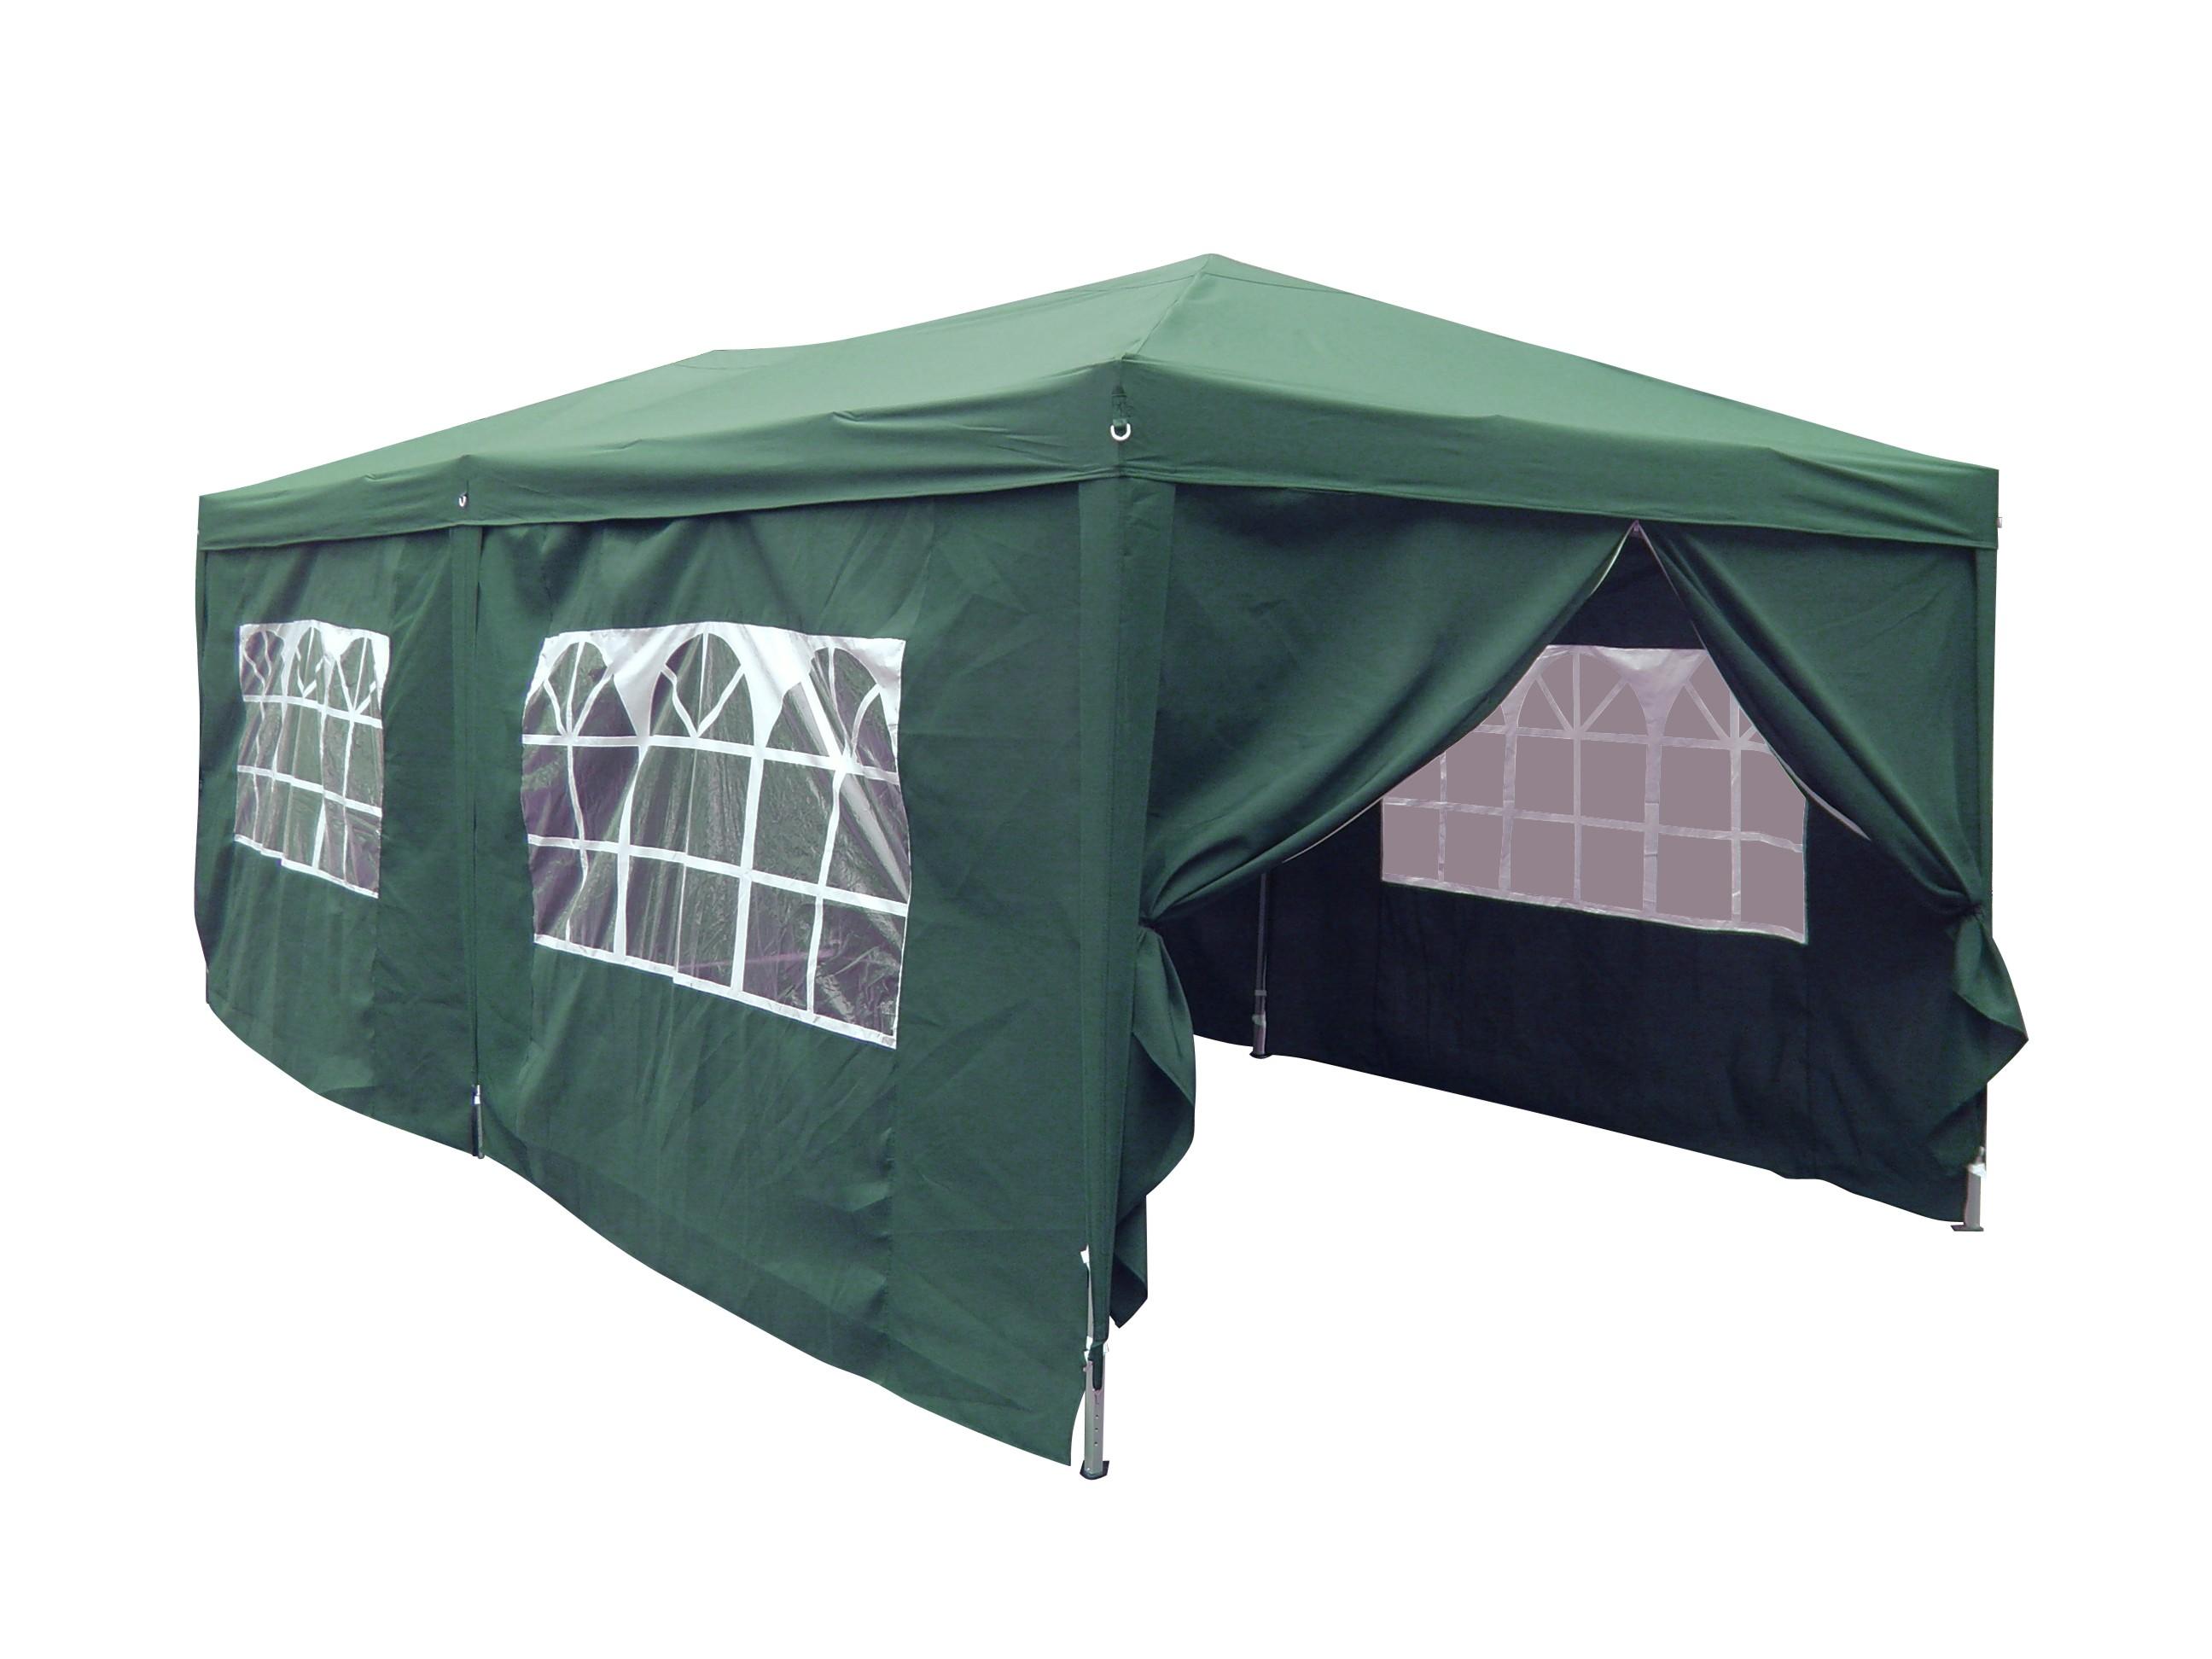 Dedeman Pavilion Gradina Pliabil Patrat Cadru Metalic Poliester Verde 3 X 6 M Dedicat Planurilor Tale